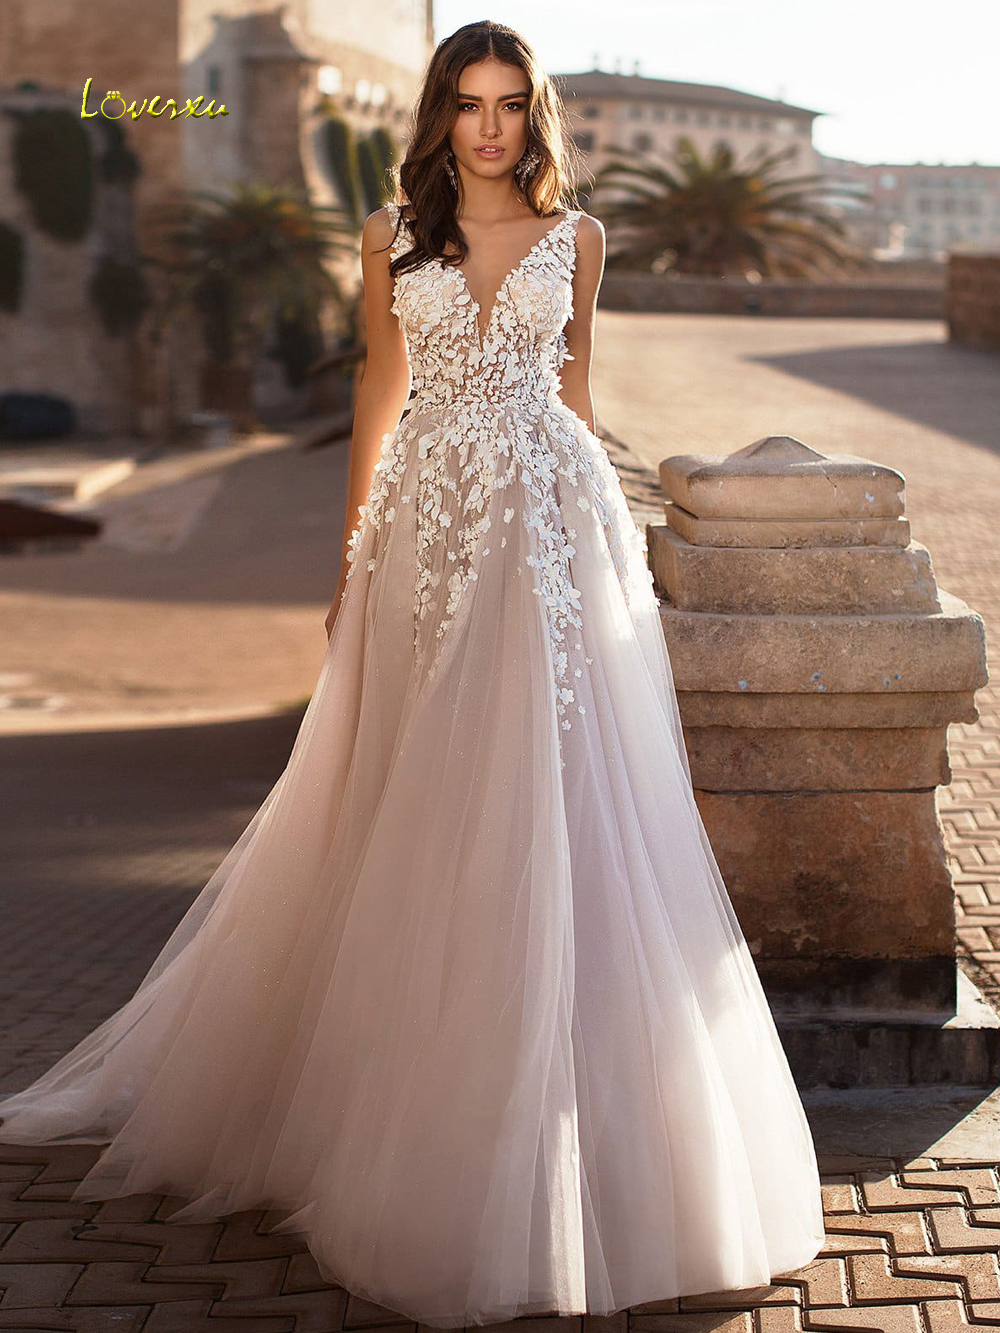 Loverxu Sexy Backless V Neck Flowers Vintage Wedding Dresses 2019